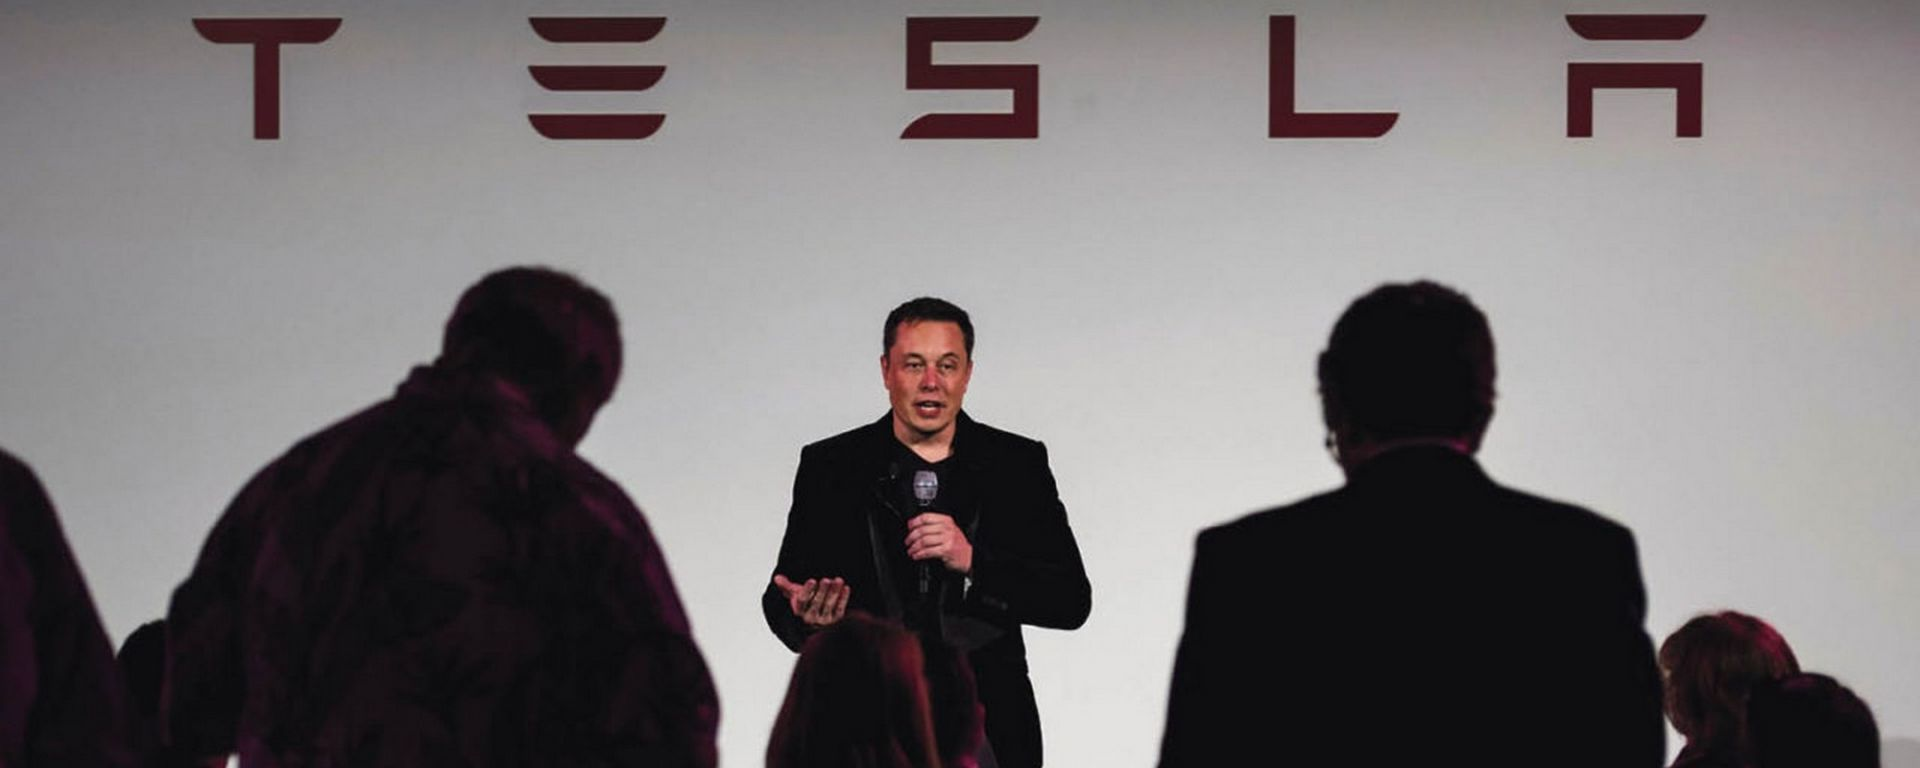 Tesla, crisi finanziaria sempre più preoccupante